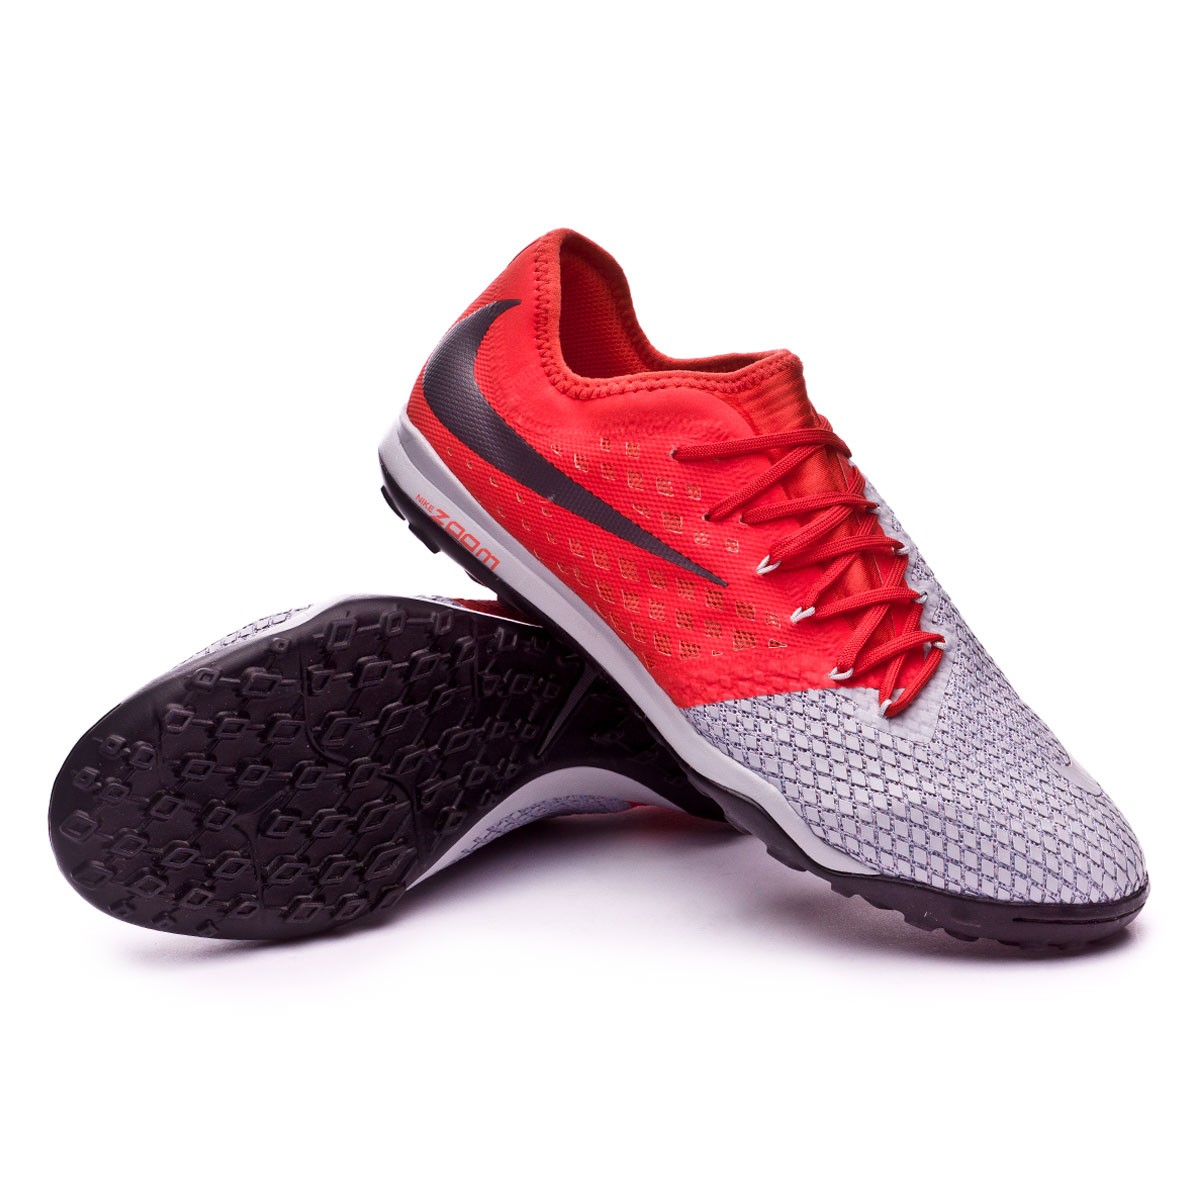 4fdd2b424 Nike Hypervenom Zoom PhantomX III Pro Turf Football Boot. Wolf grey-Metallic  dark ...